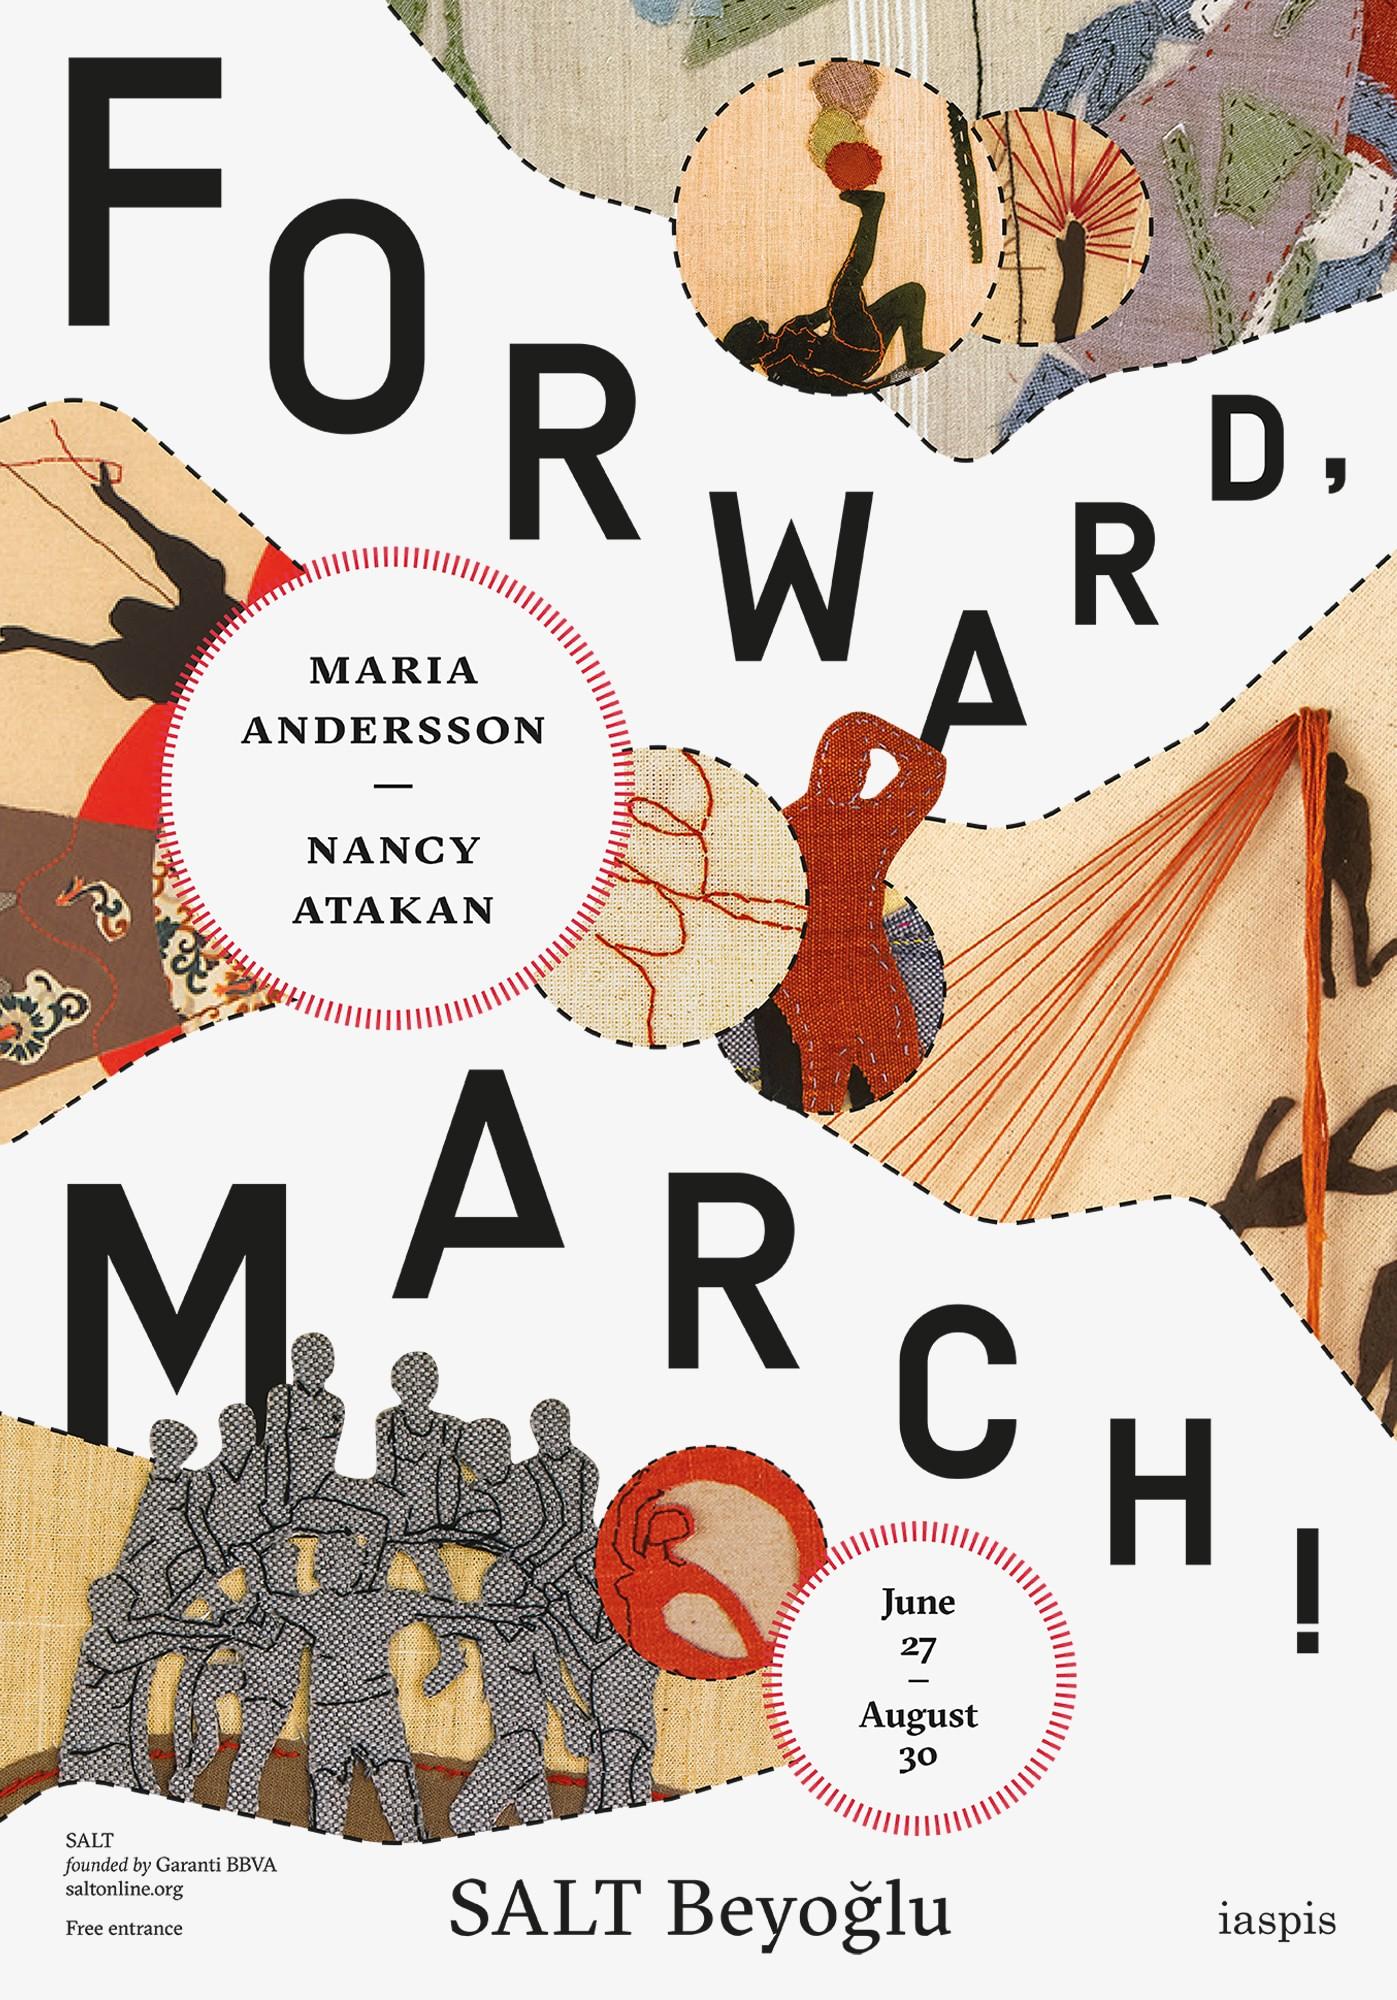 Uygun Adım Marş/Forward, March!